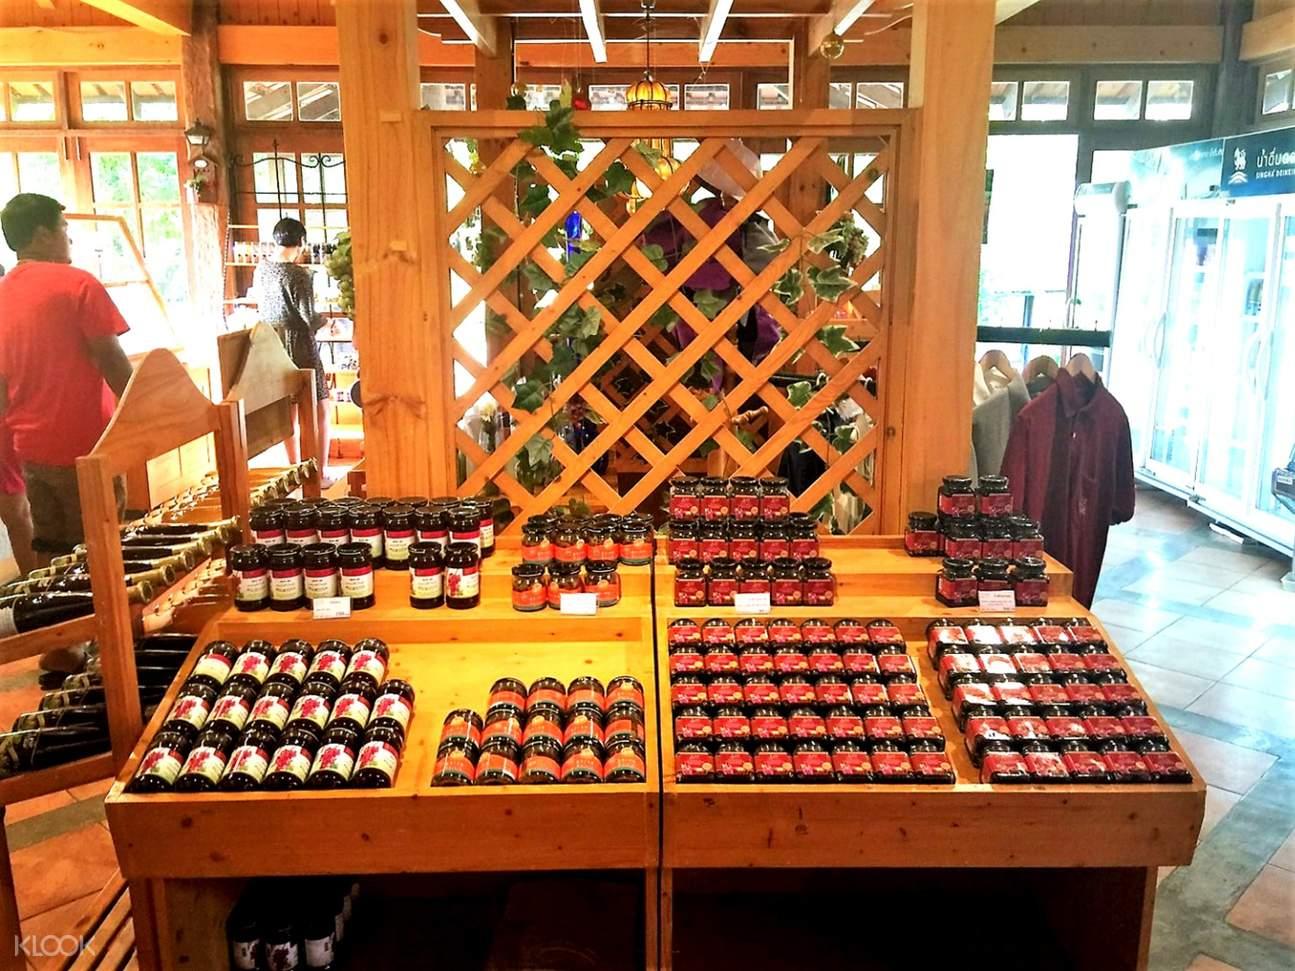 PB Valley Vineyard and Wine Tasting Tour in Khao Yai